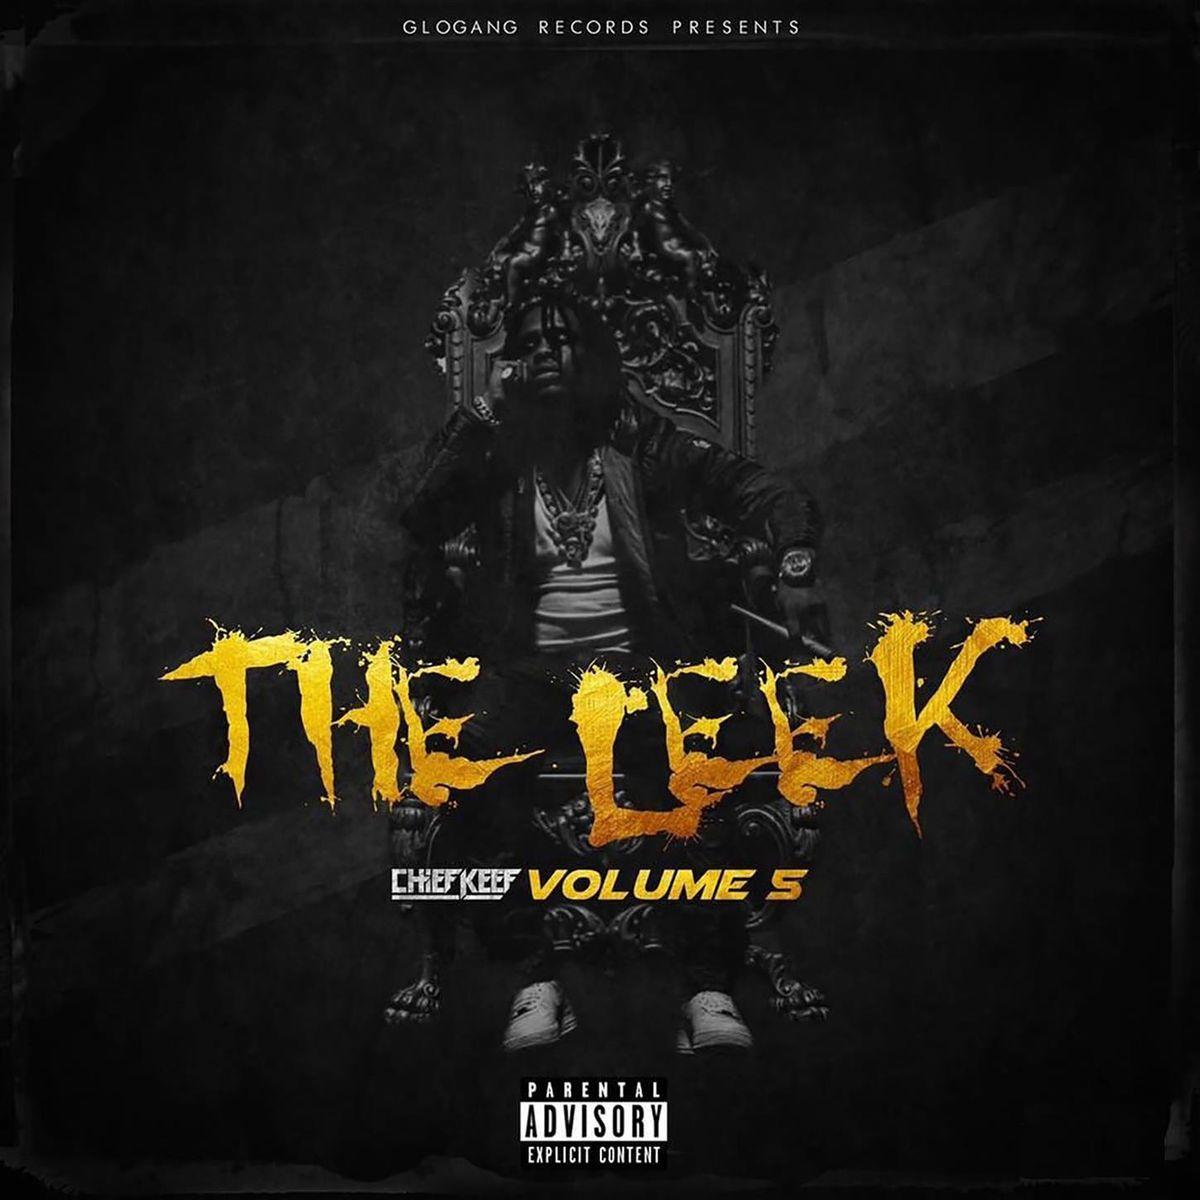 Chief Keef - The Leek (Vol. 5)